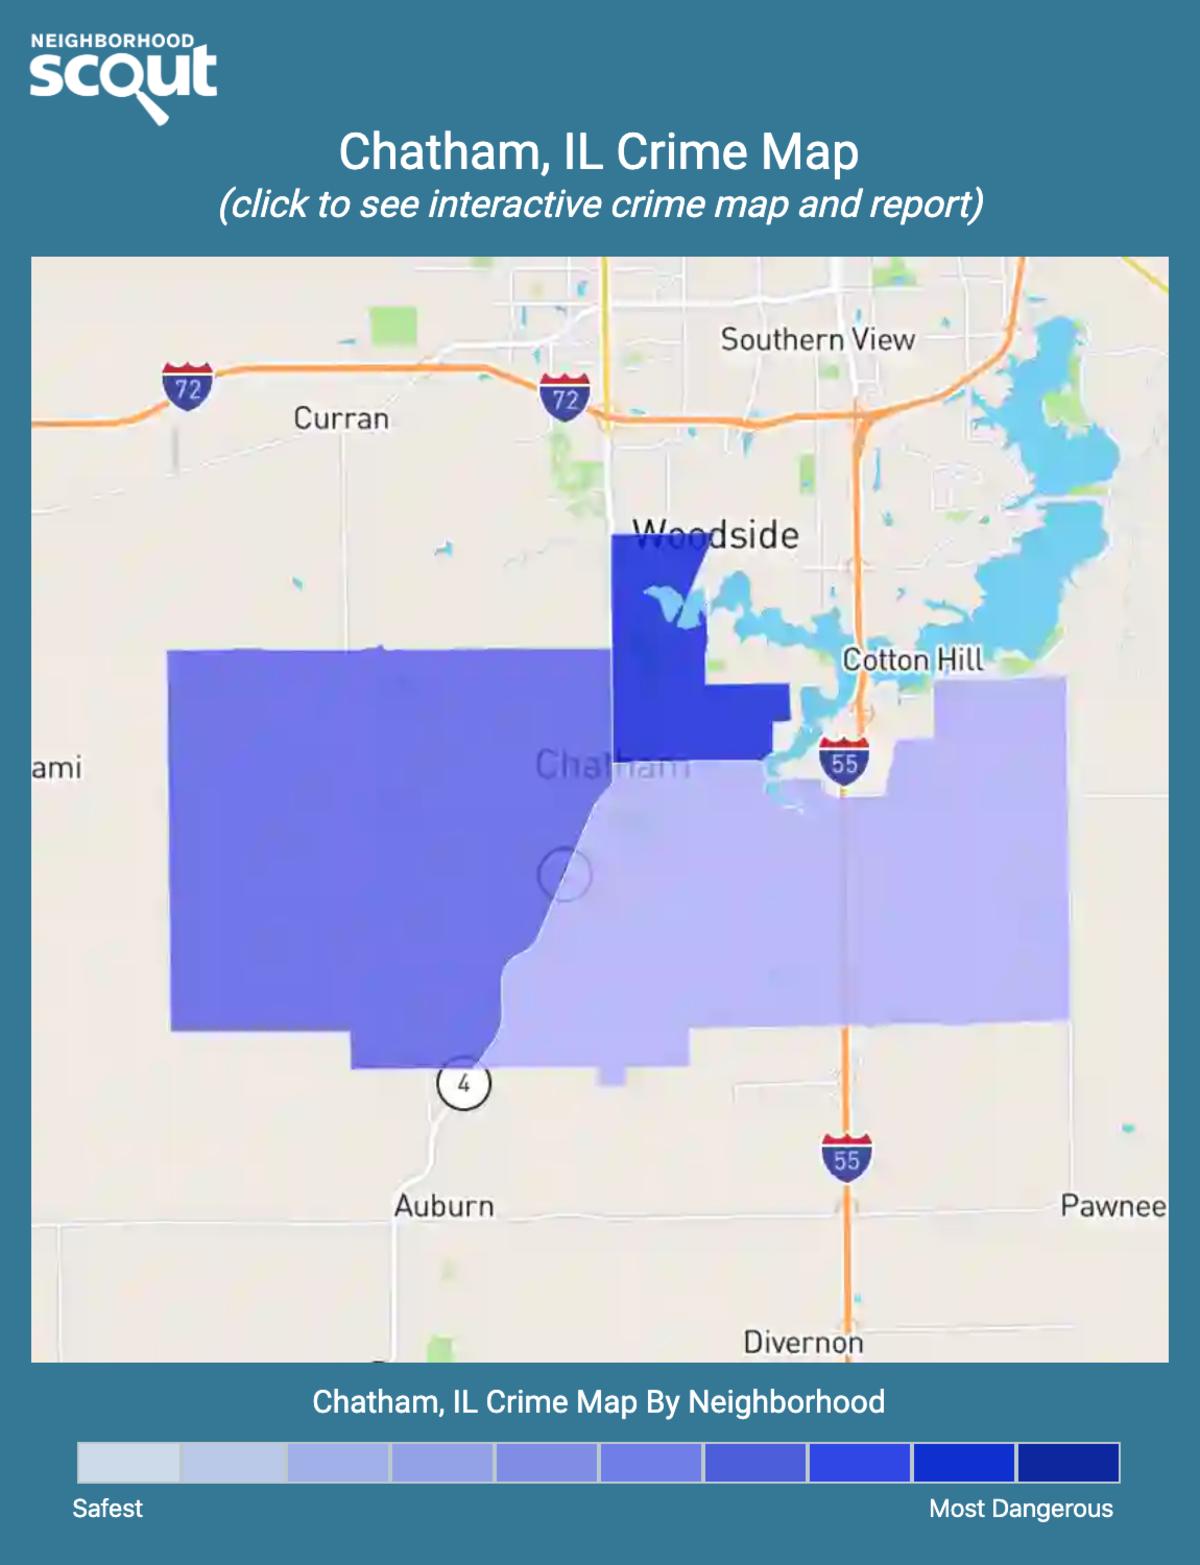 Chatham, Illinois crime map